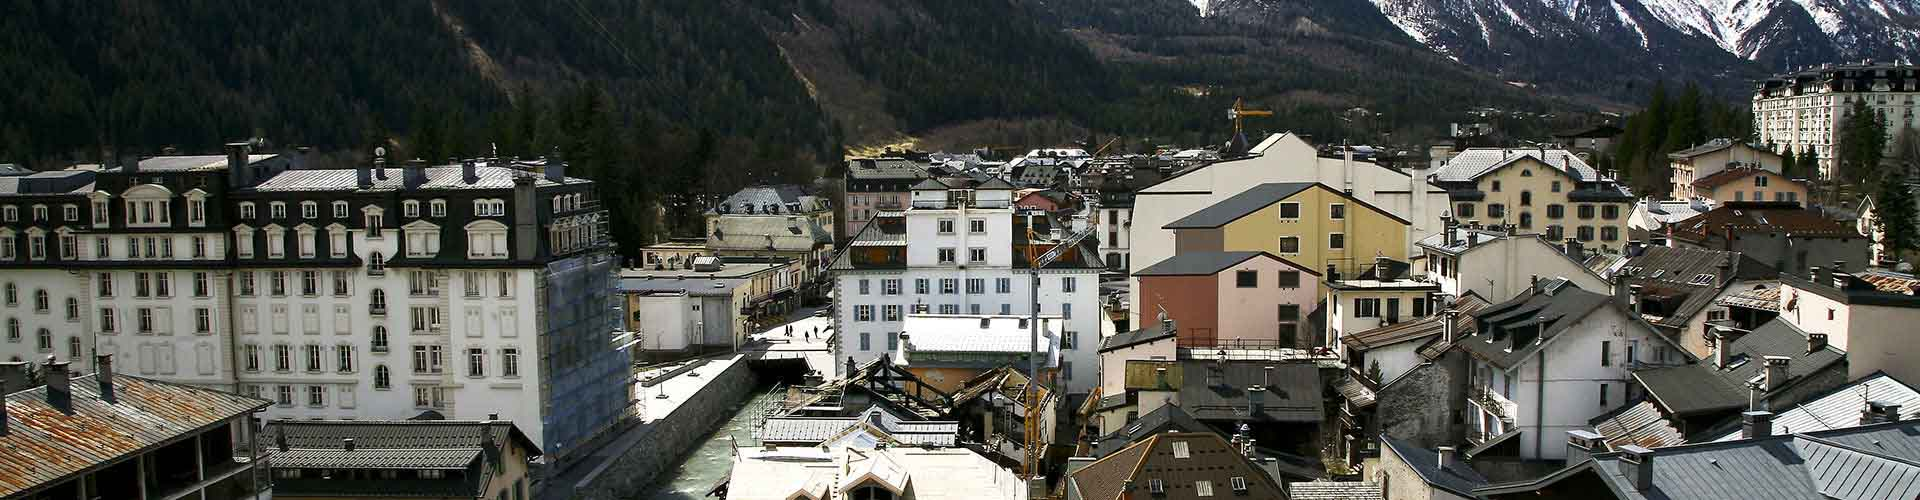 Chamonix - Hostales en Chamonix. Mapas de Chamonix, Fotos y comentarios de cada Hostal en Chamonix.